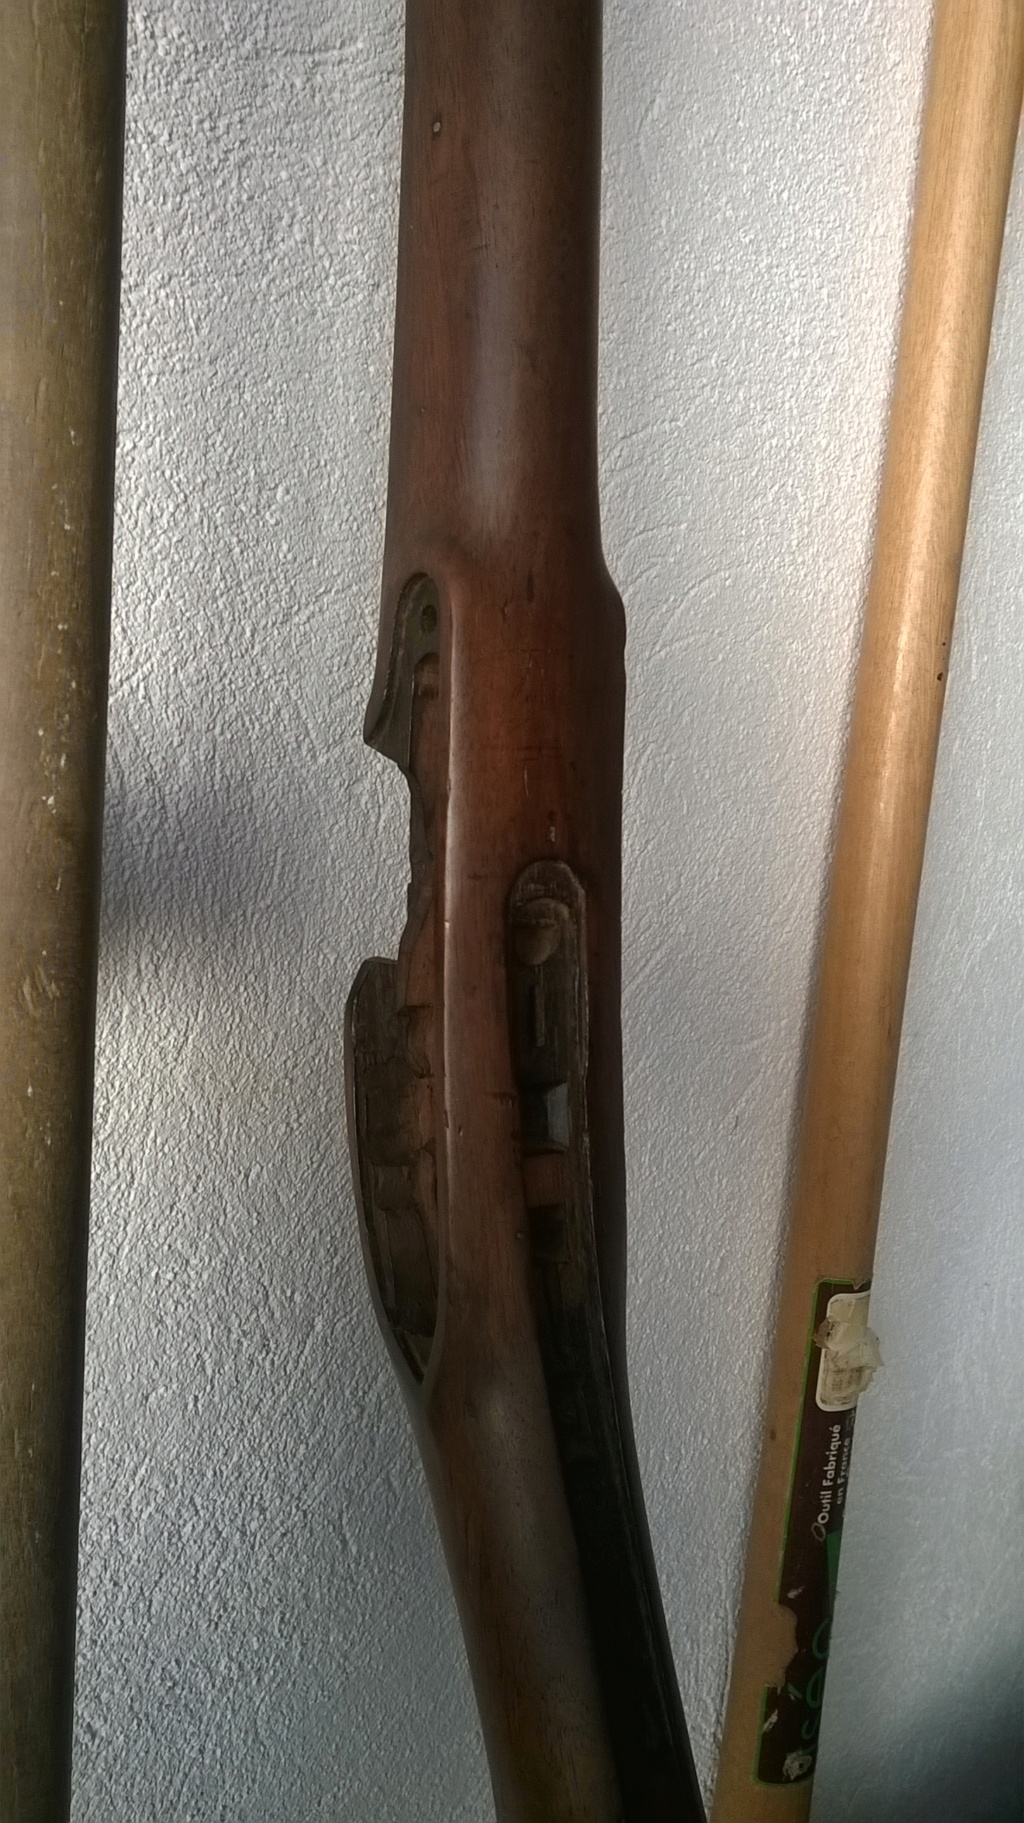 Fusil 1822 T Bis sorti de grenier Wp_20139